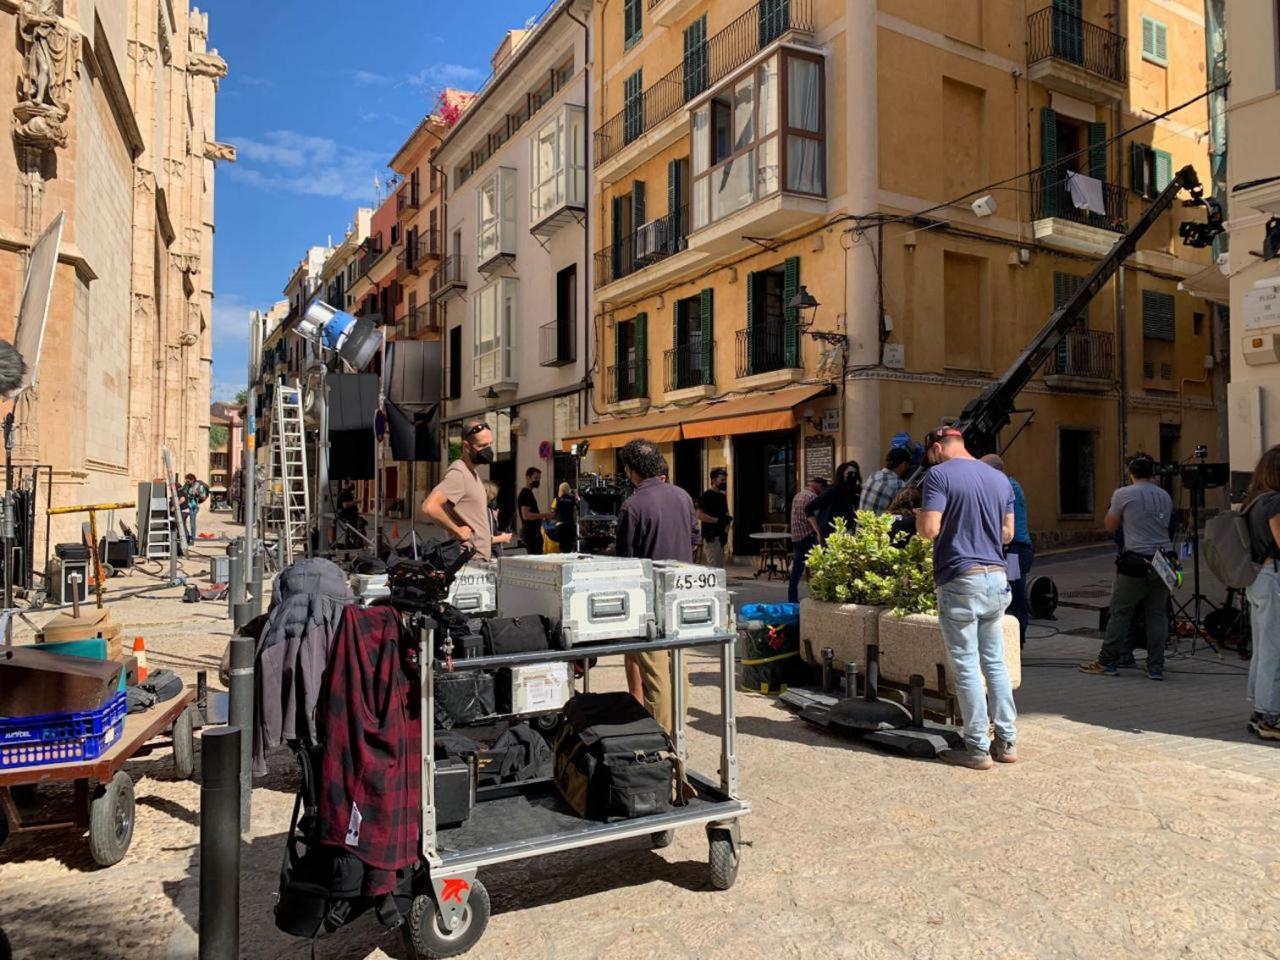 Preparations for Ana de Armas shoot in La Lonja.